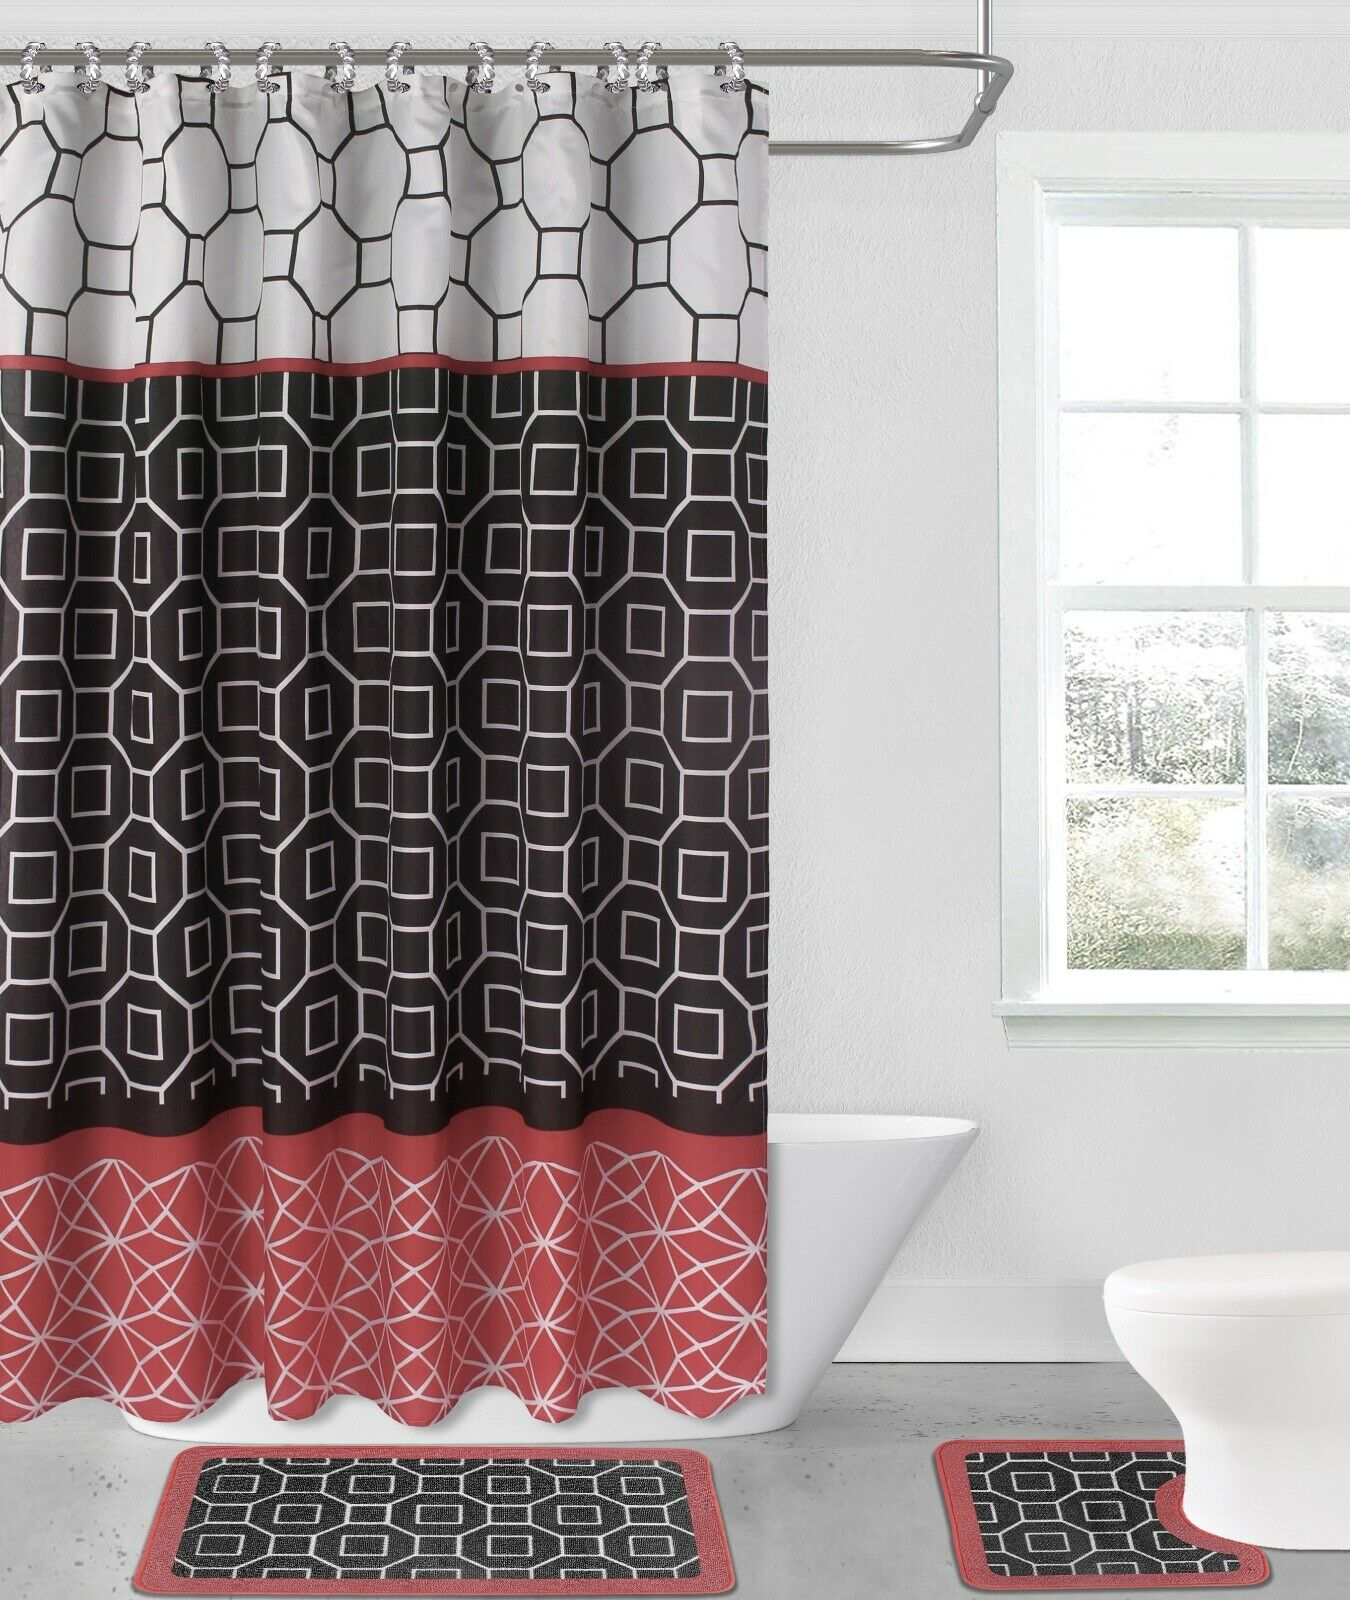 diamond red black 15 piece hotel bathroom sets 2 non slip bath mats rugs fabric shower curtain 12 hooks